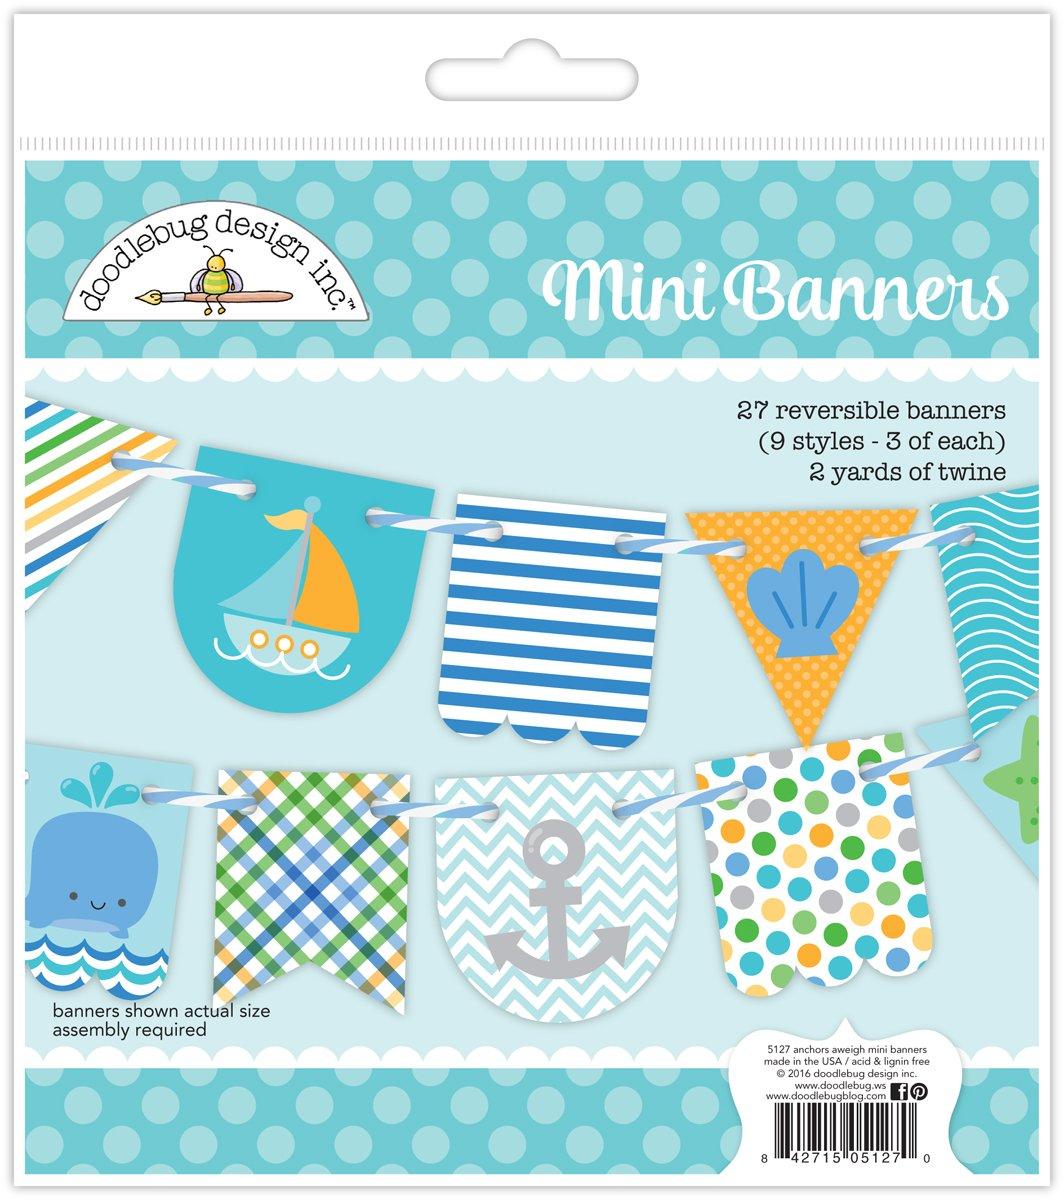 Anchors Aweigh Mini Banners